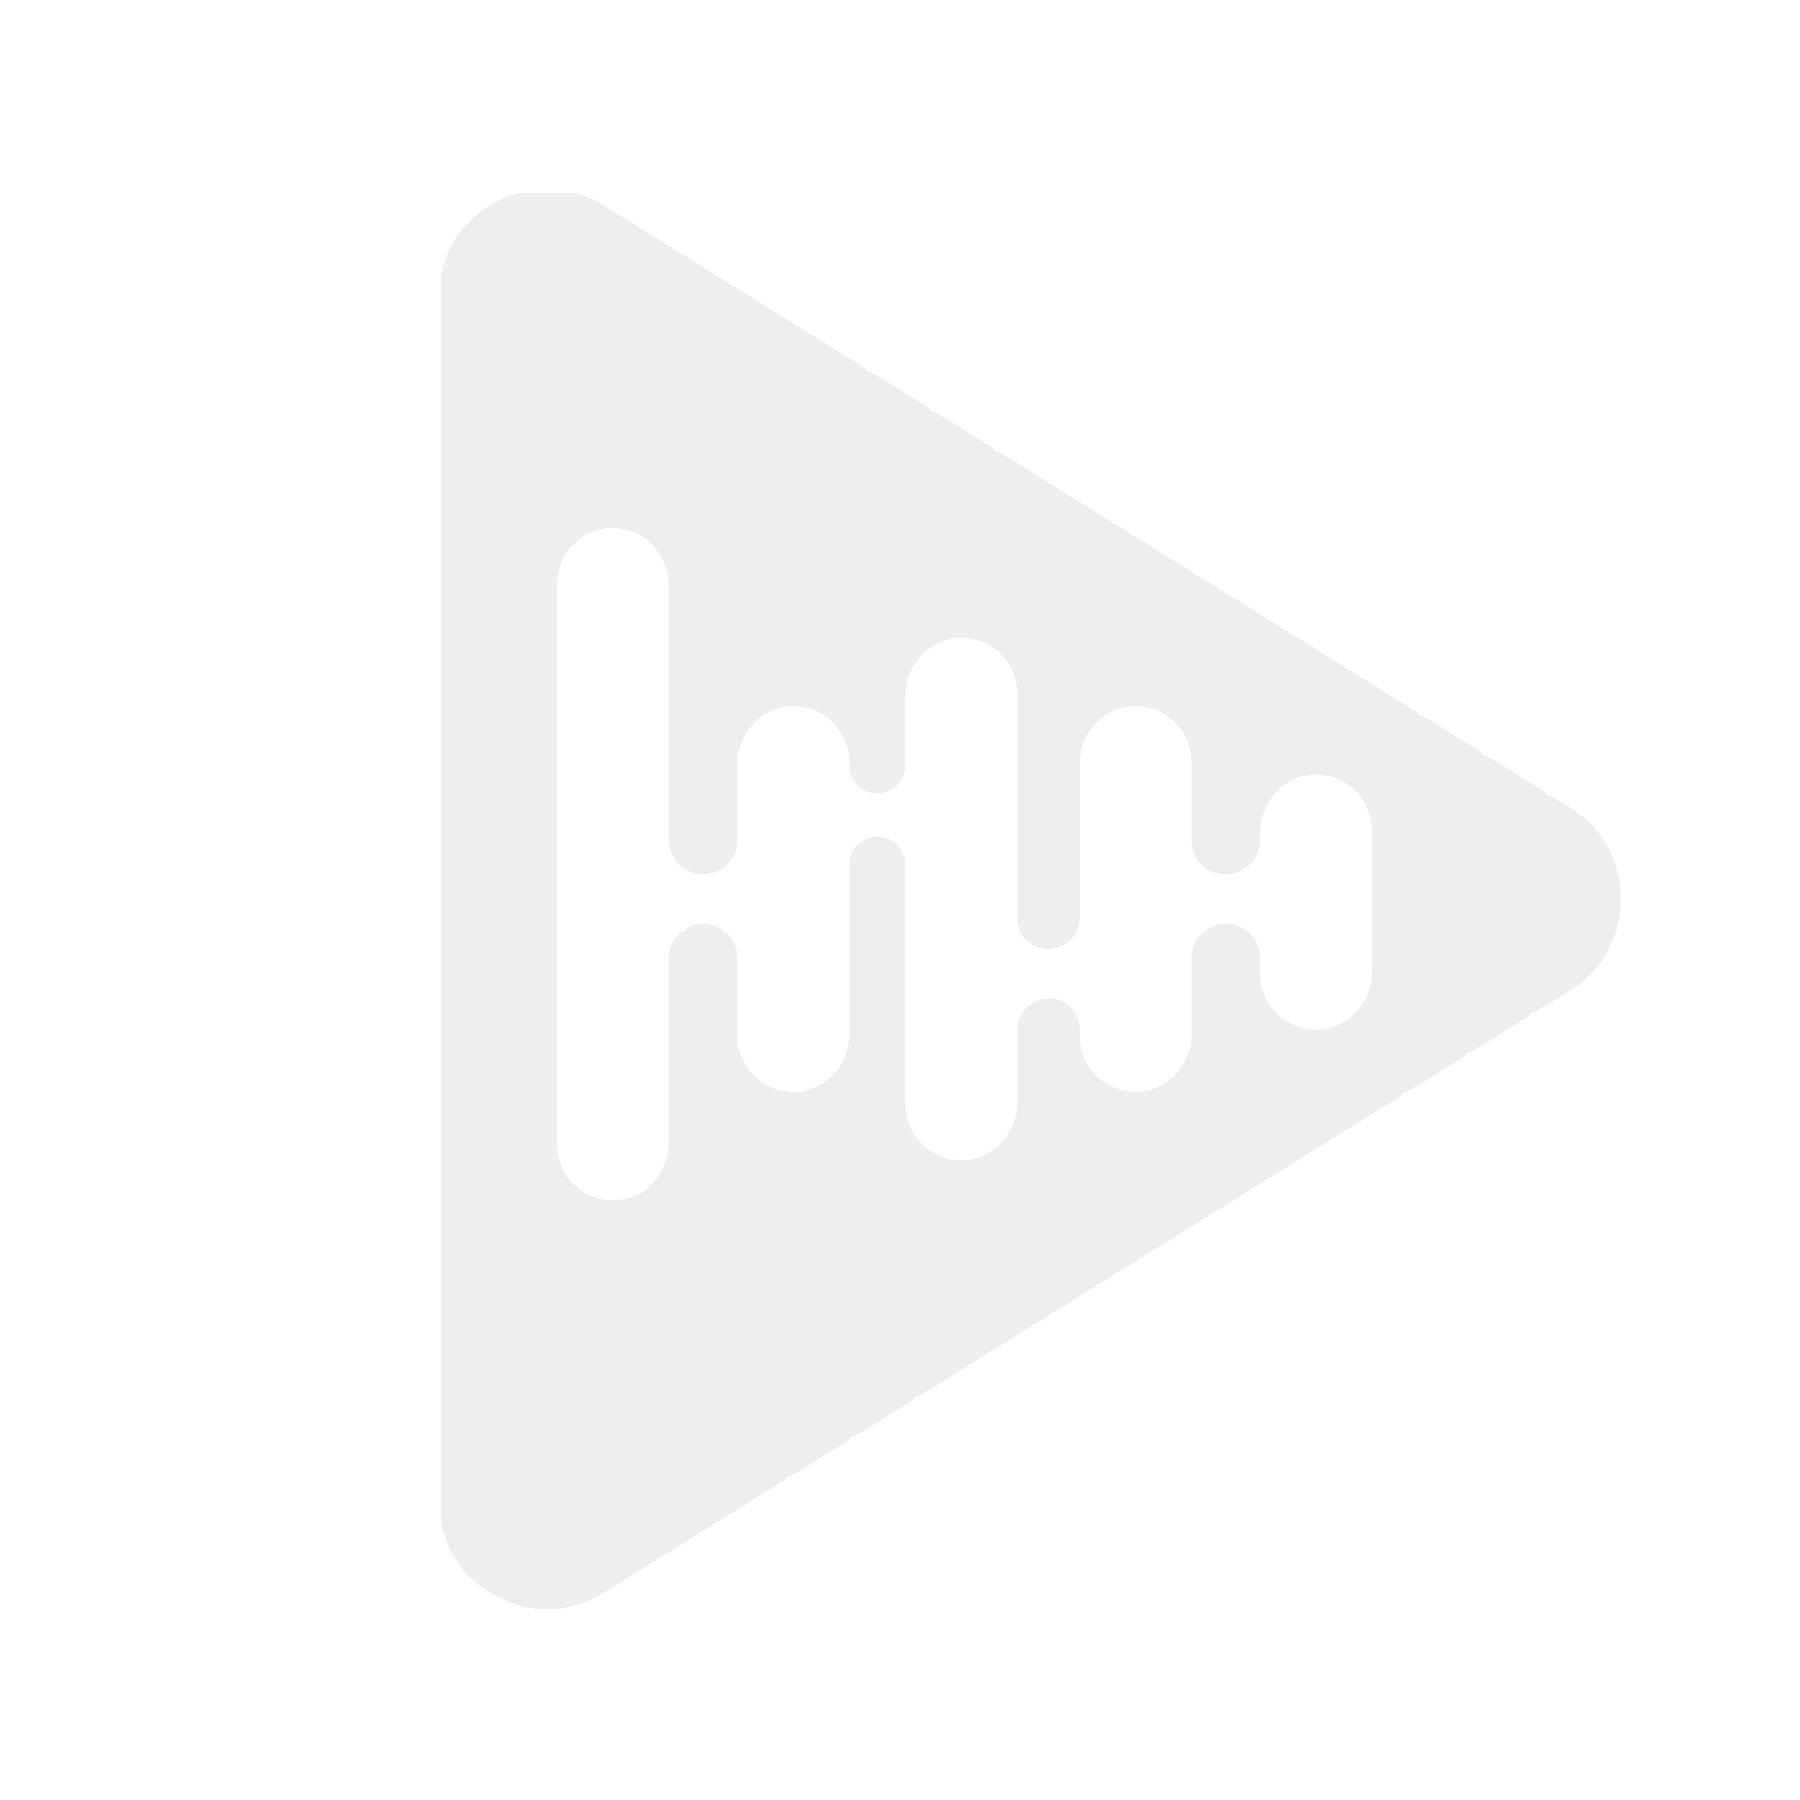 Phonocar VM272 - Biltilpasset ryggekamera